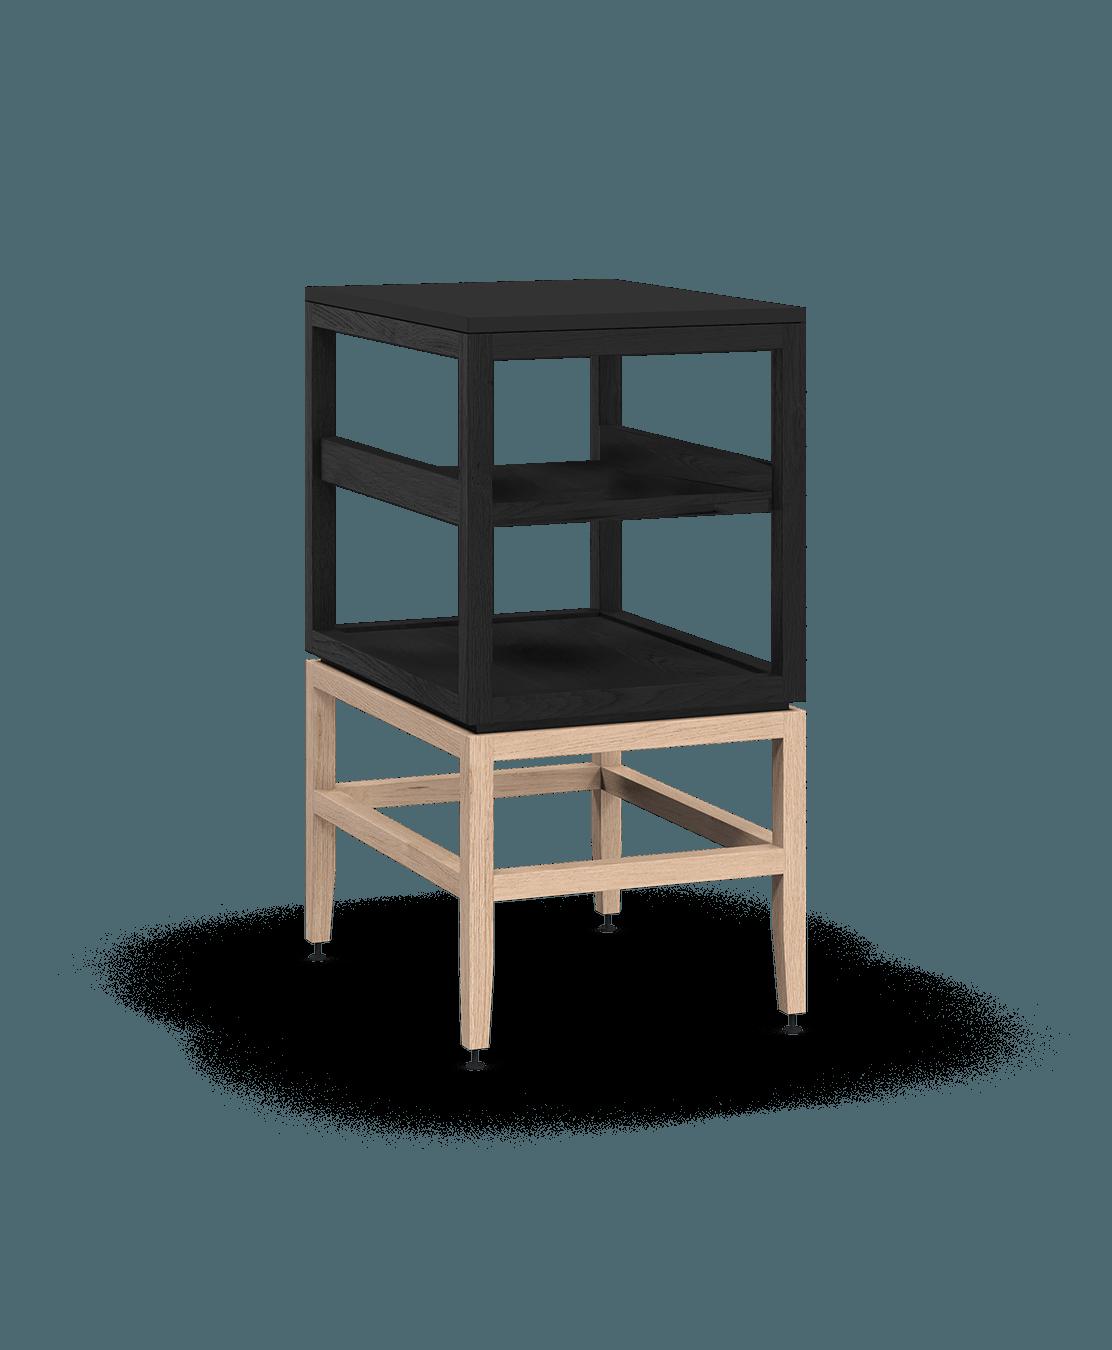 coquo volitare midnight black stained oak white oak solid wood modular cube 1 shelf storage open cabinet 18 inch C2-N-1824-001W2-BK-NA